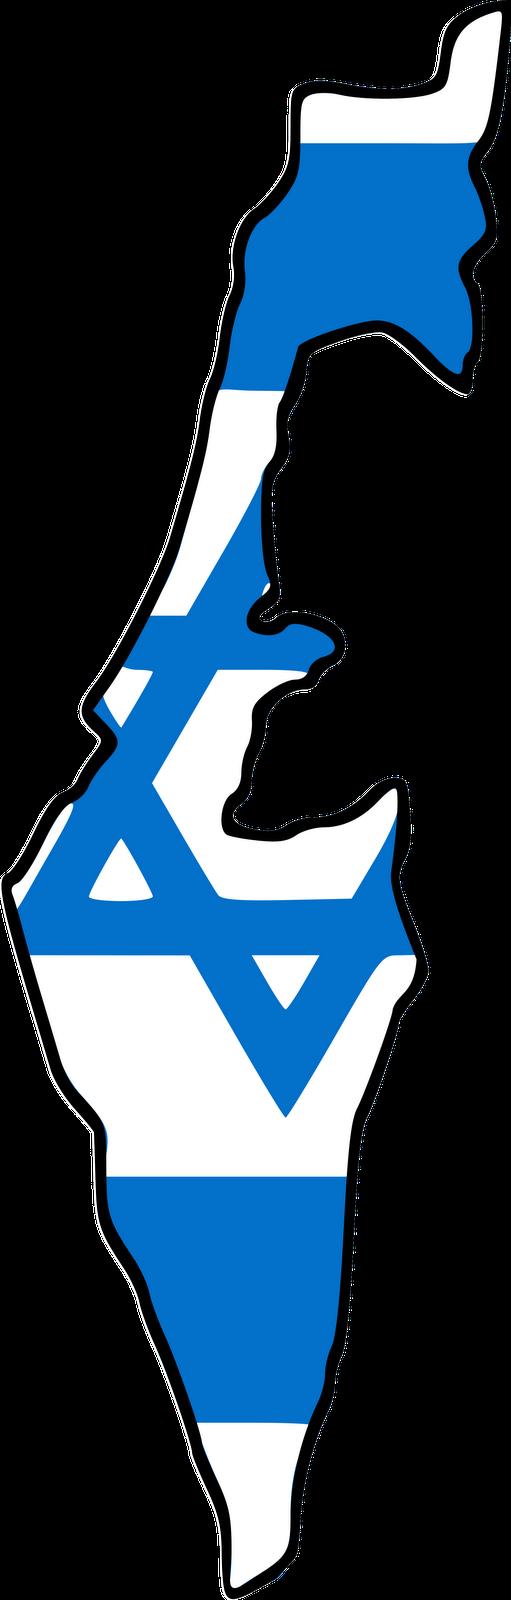 clipart israel flag - photo #5